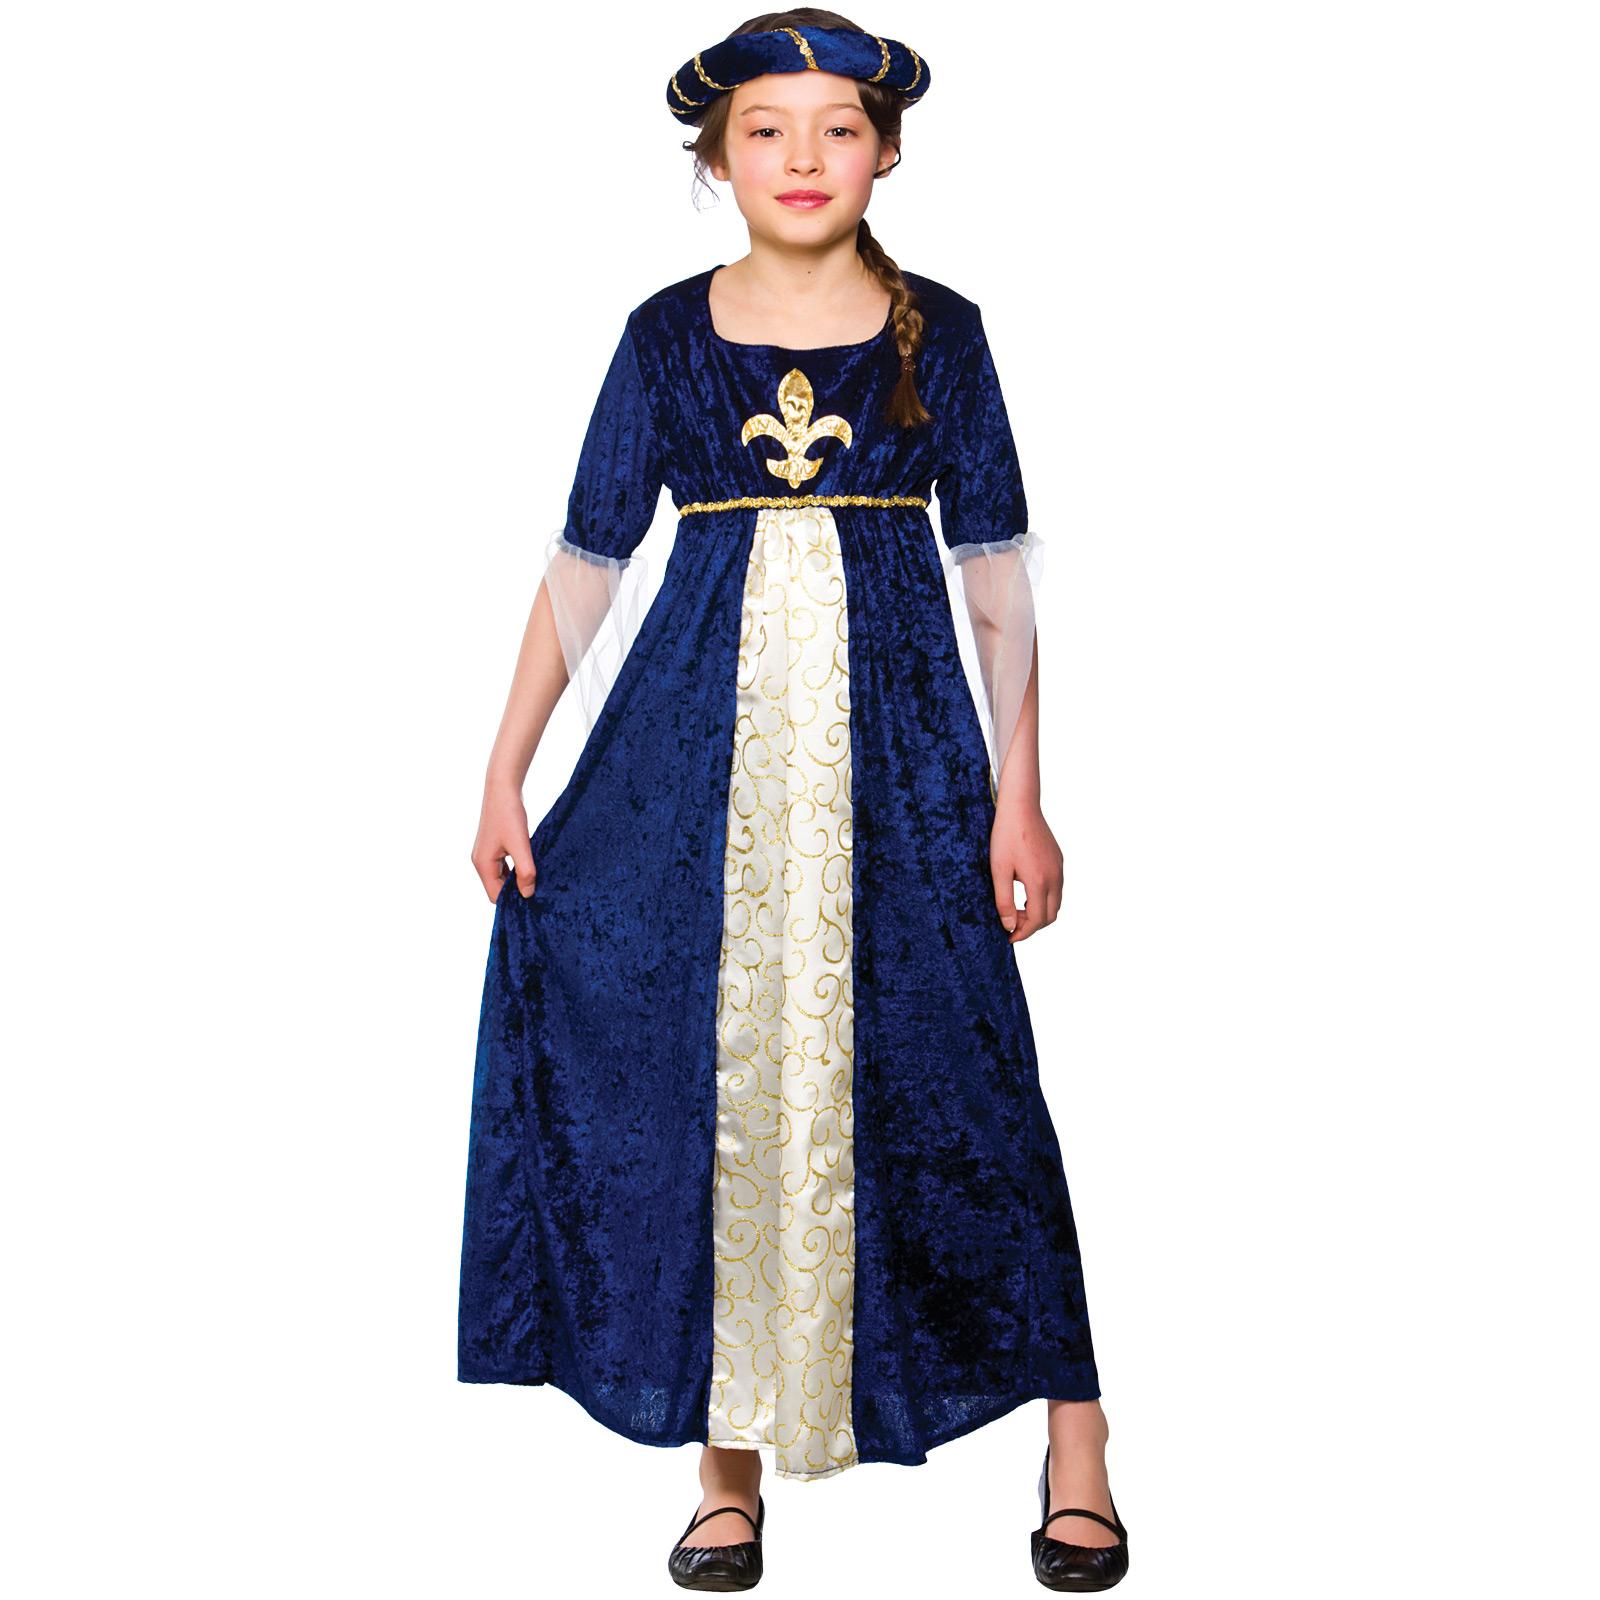 Girls-Regal-Princess-Costume-Fancy-Dress-Up-Party-  sc 1 st  eBay & Girls Regal Princess Costume Fancy Dress Up Party Halloween Medieval ...